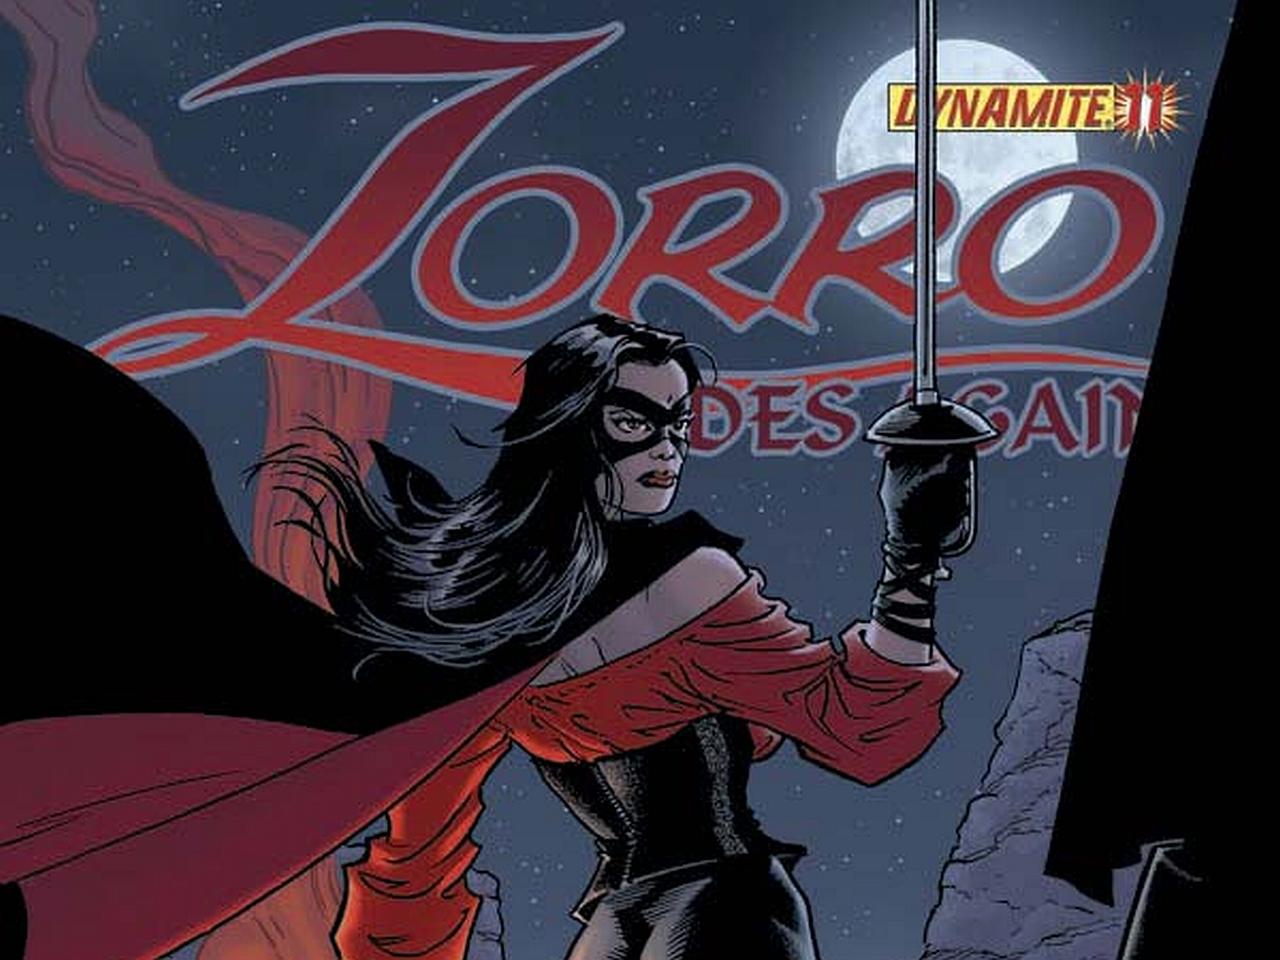 Zorro Wallpaper - Wall...